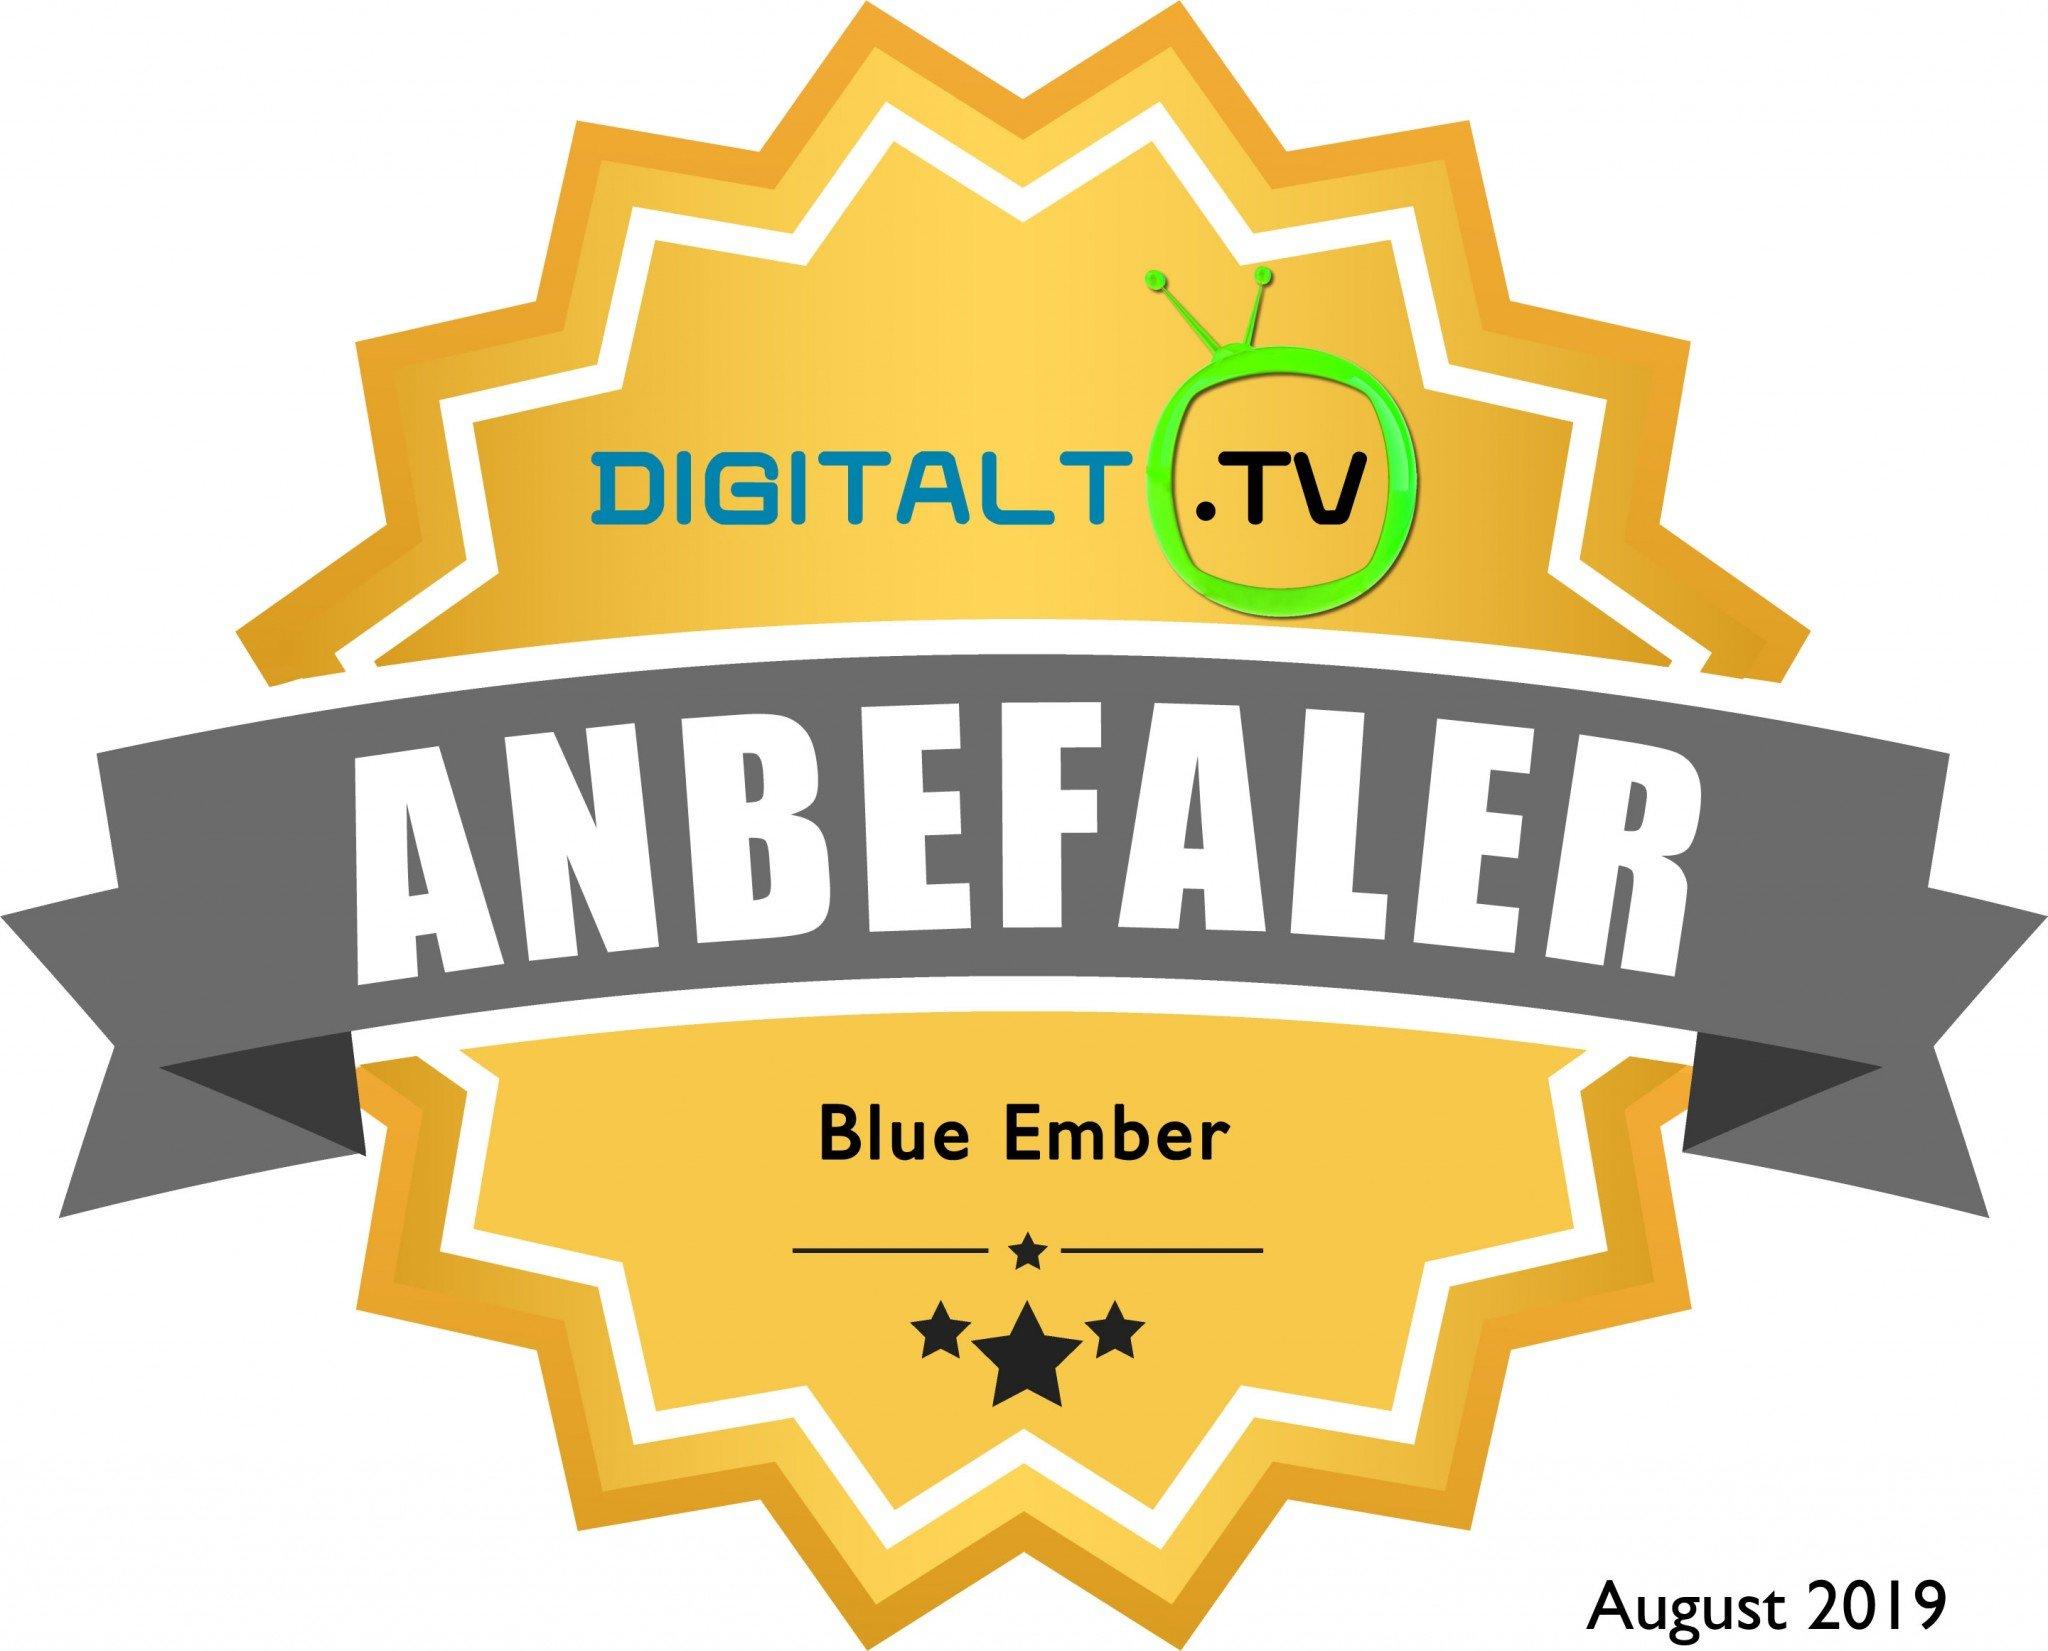 Blue Ember Logo anbefaling